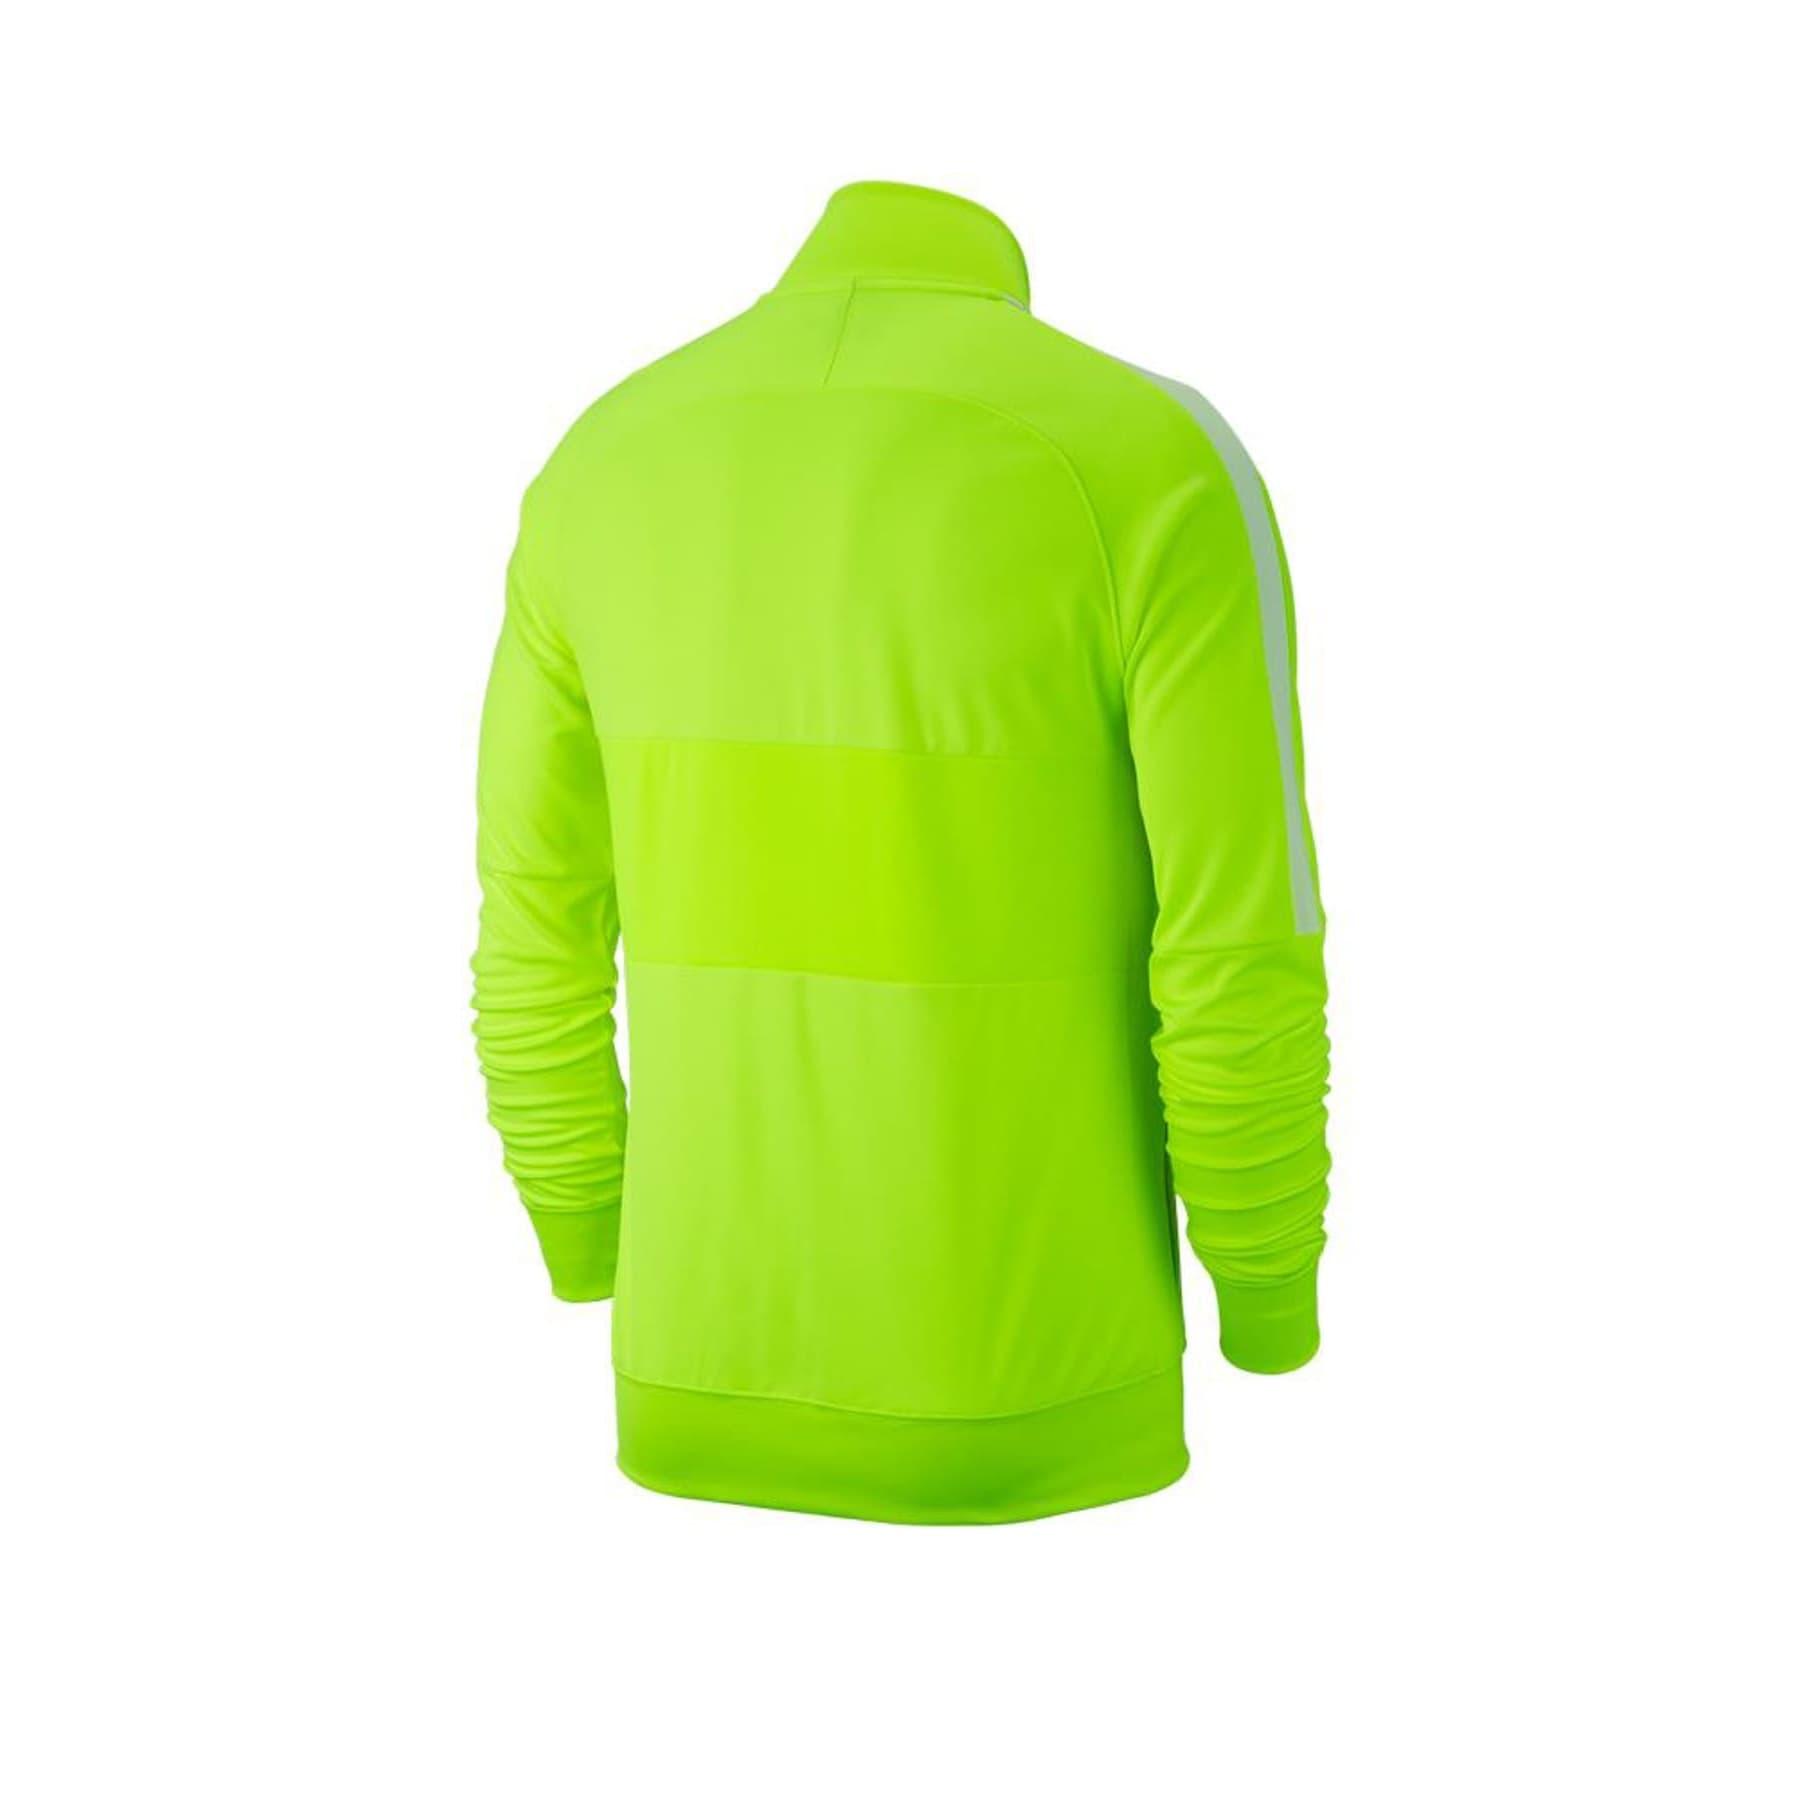 Dri-Fit Academy 19 Erkek Yeşil Futbol Ceket (AJ9180-702)